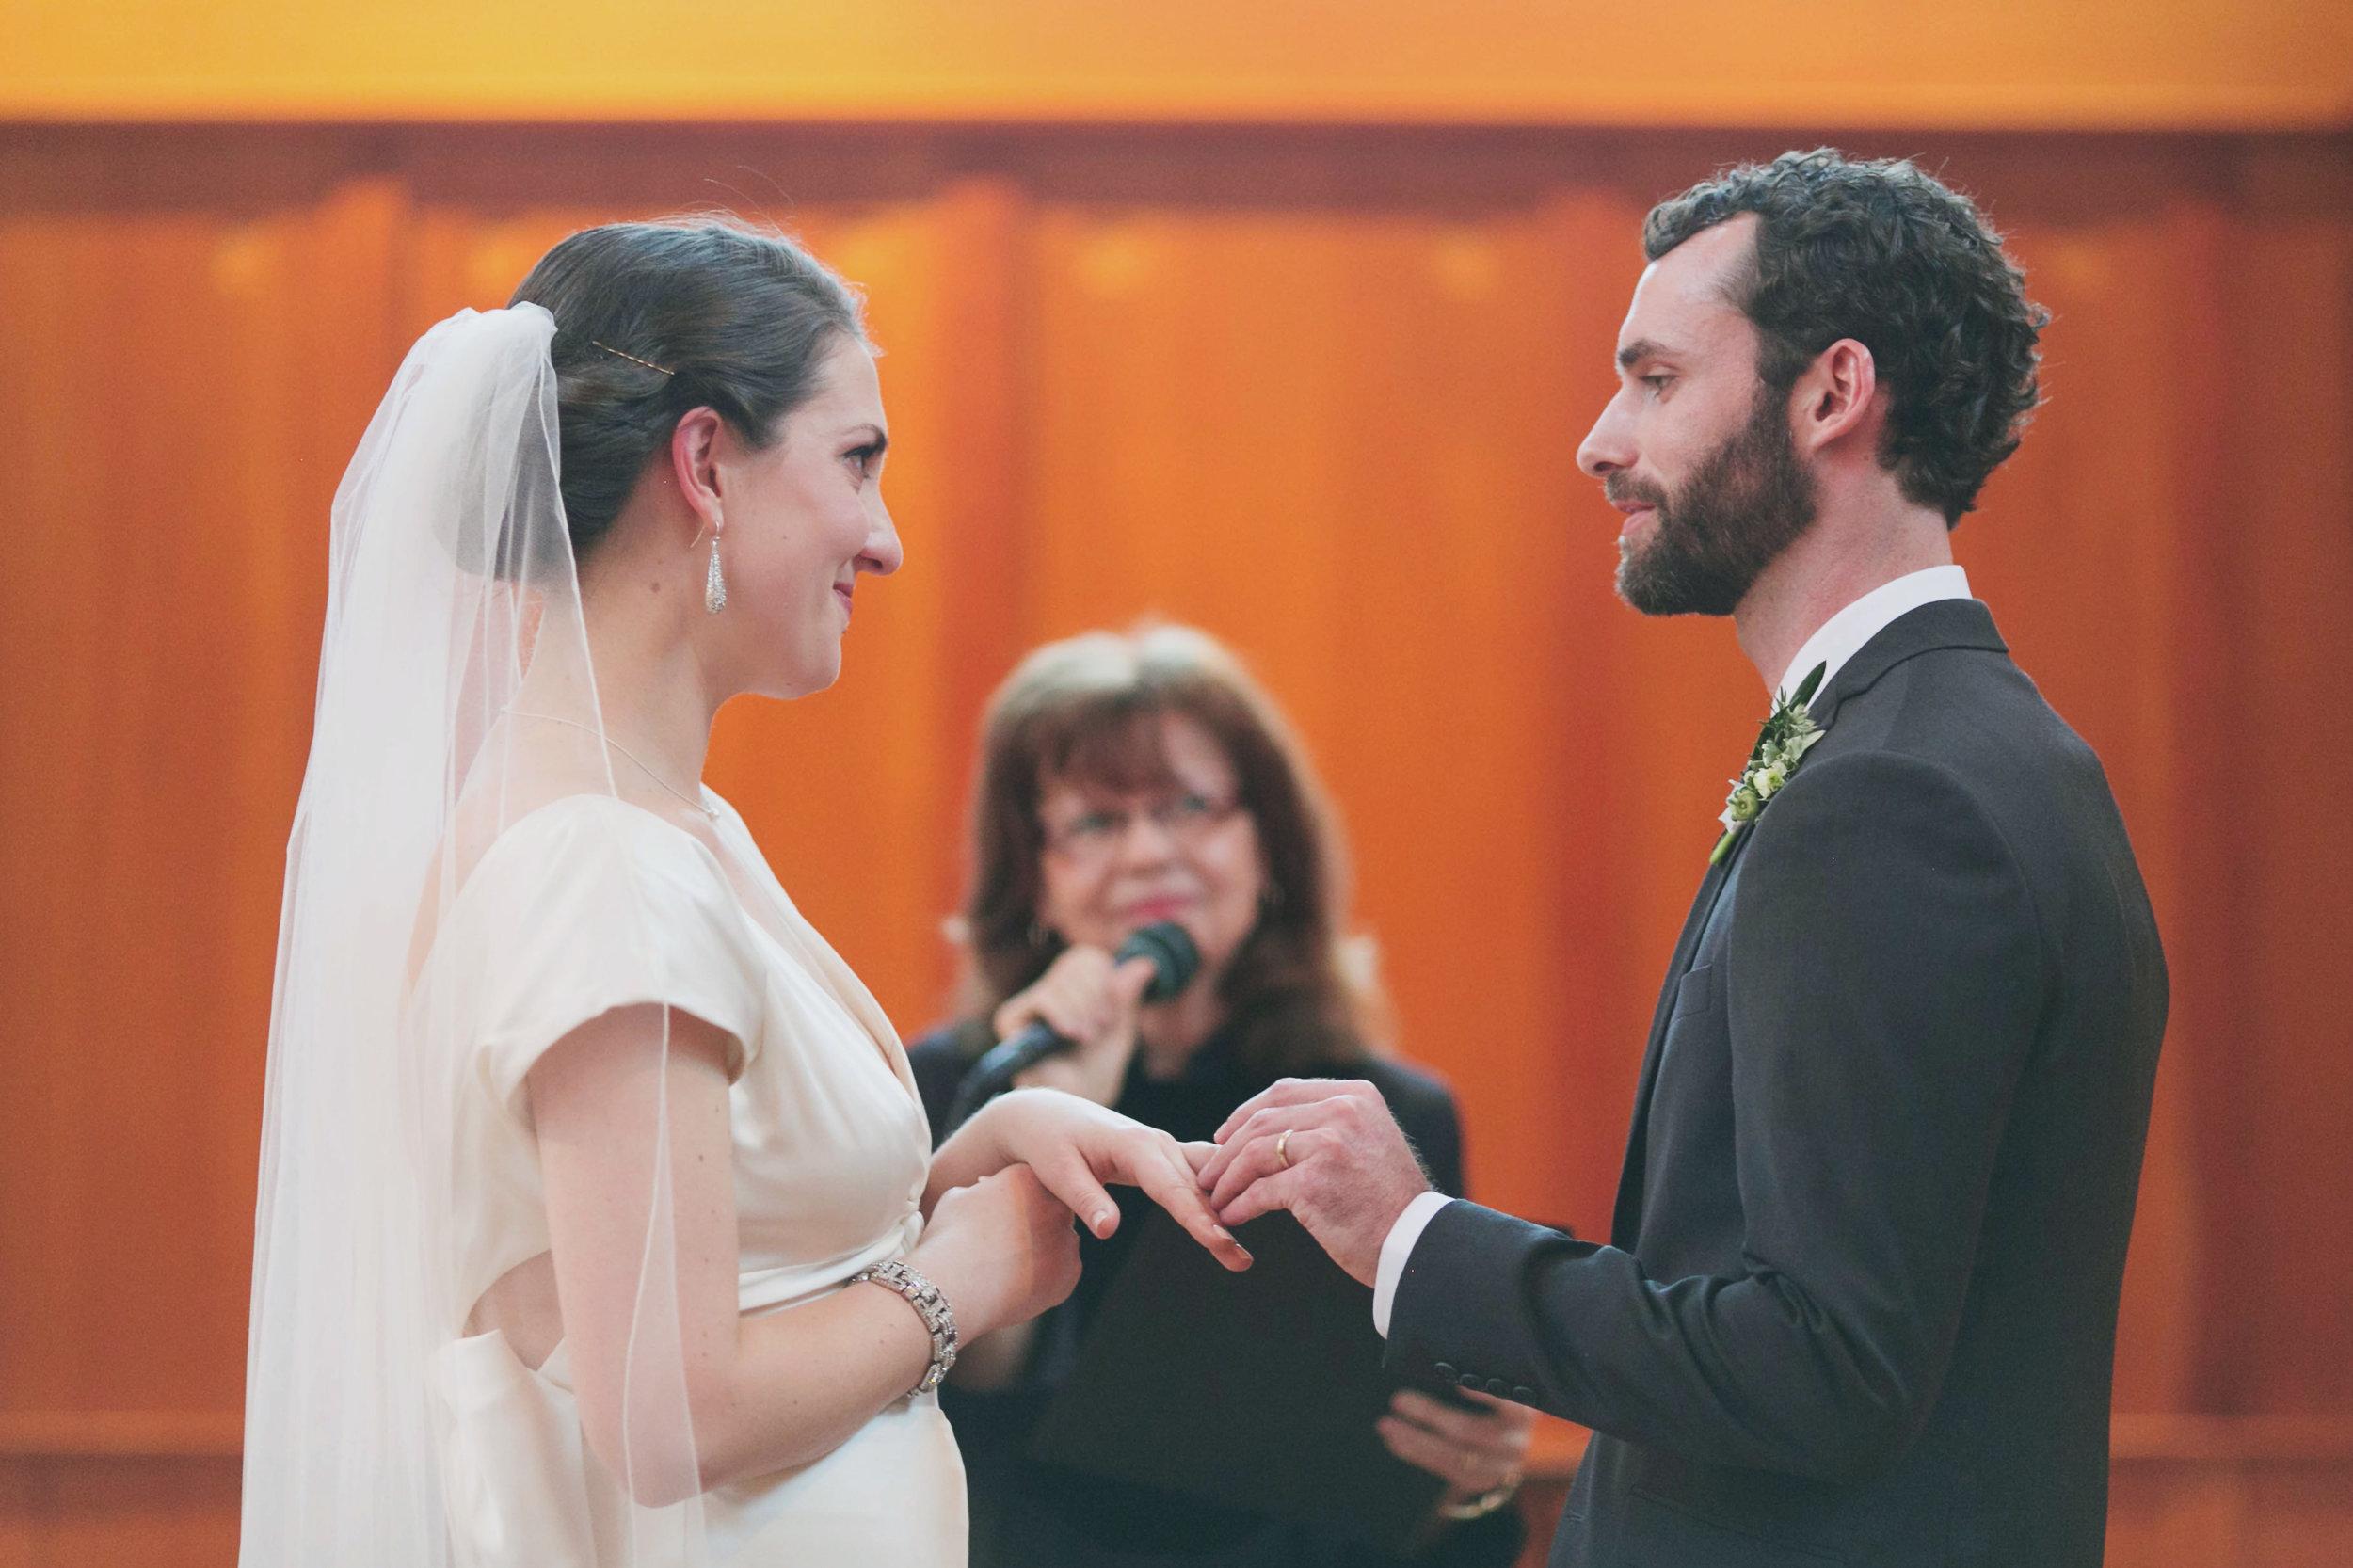 Simply-Charming-Socials_Atlanta-Wedding-Planner_Our-Labor-Of-Love_Emily-and-Jon_18.jpg